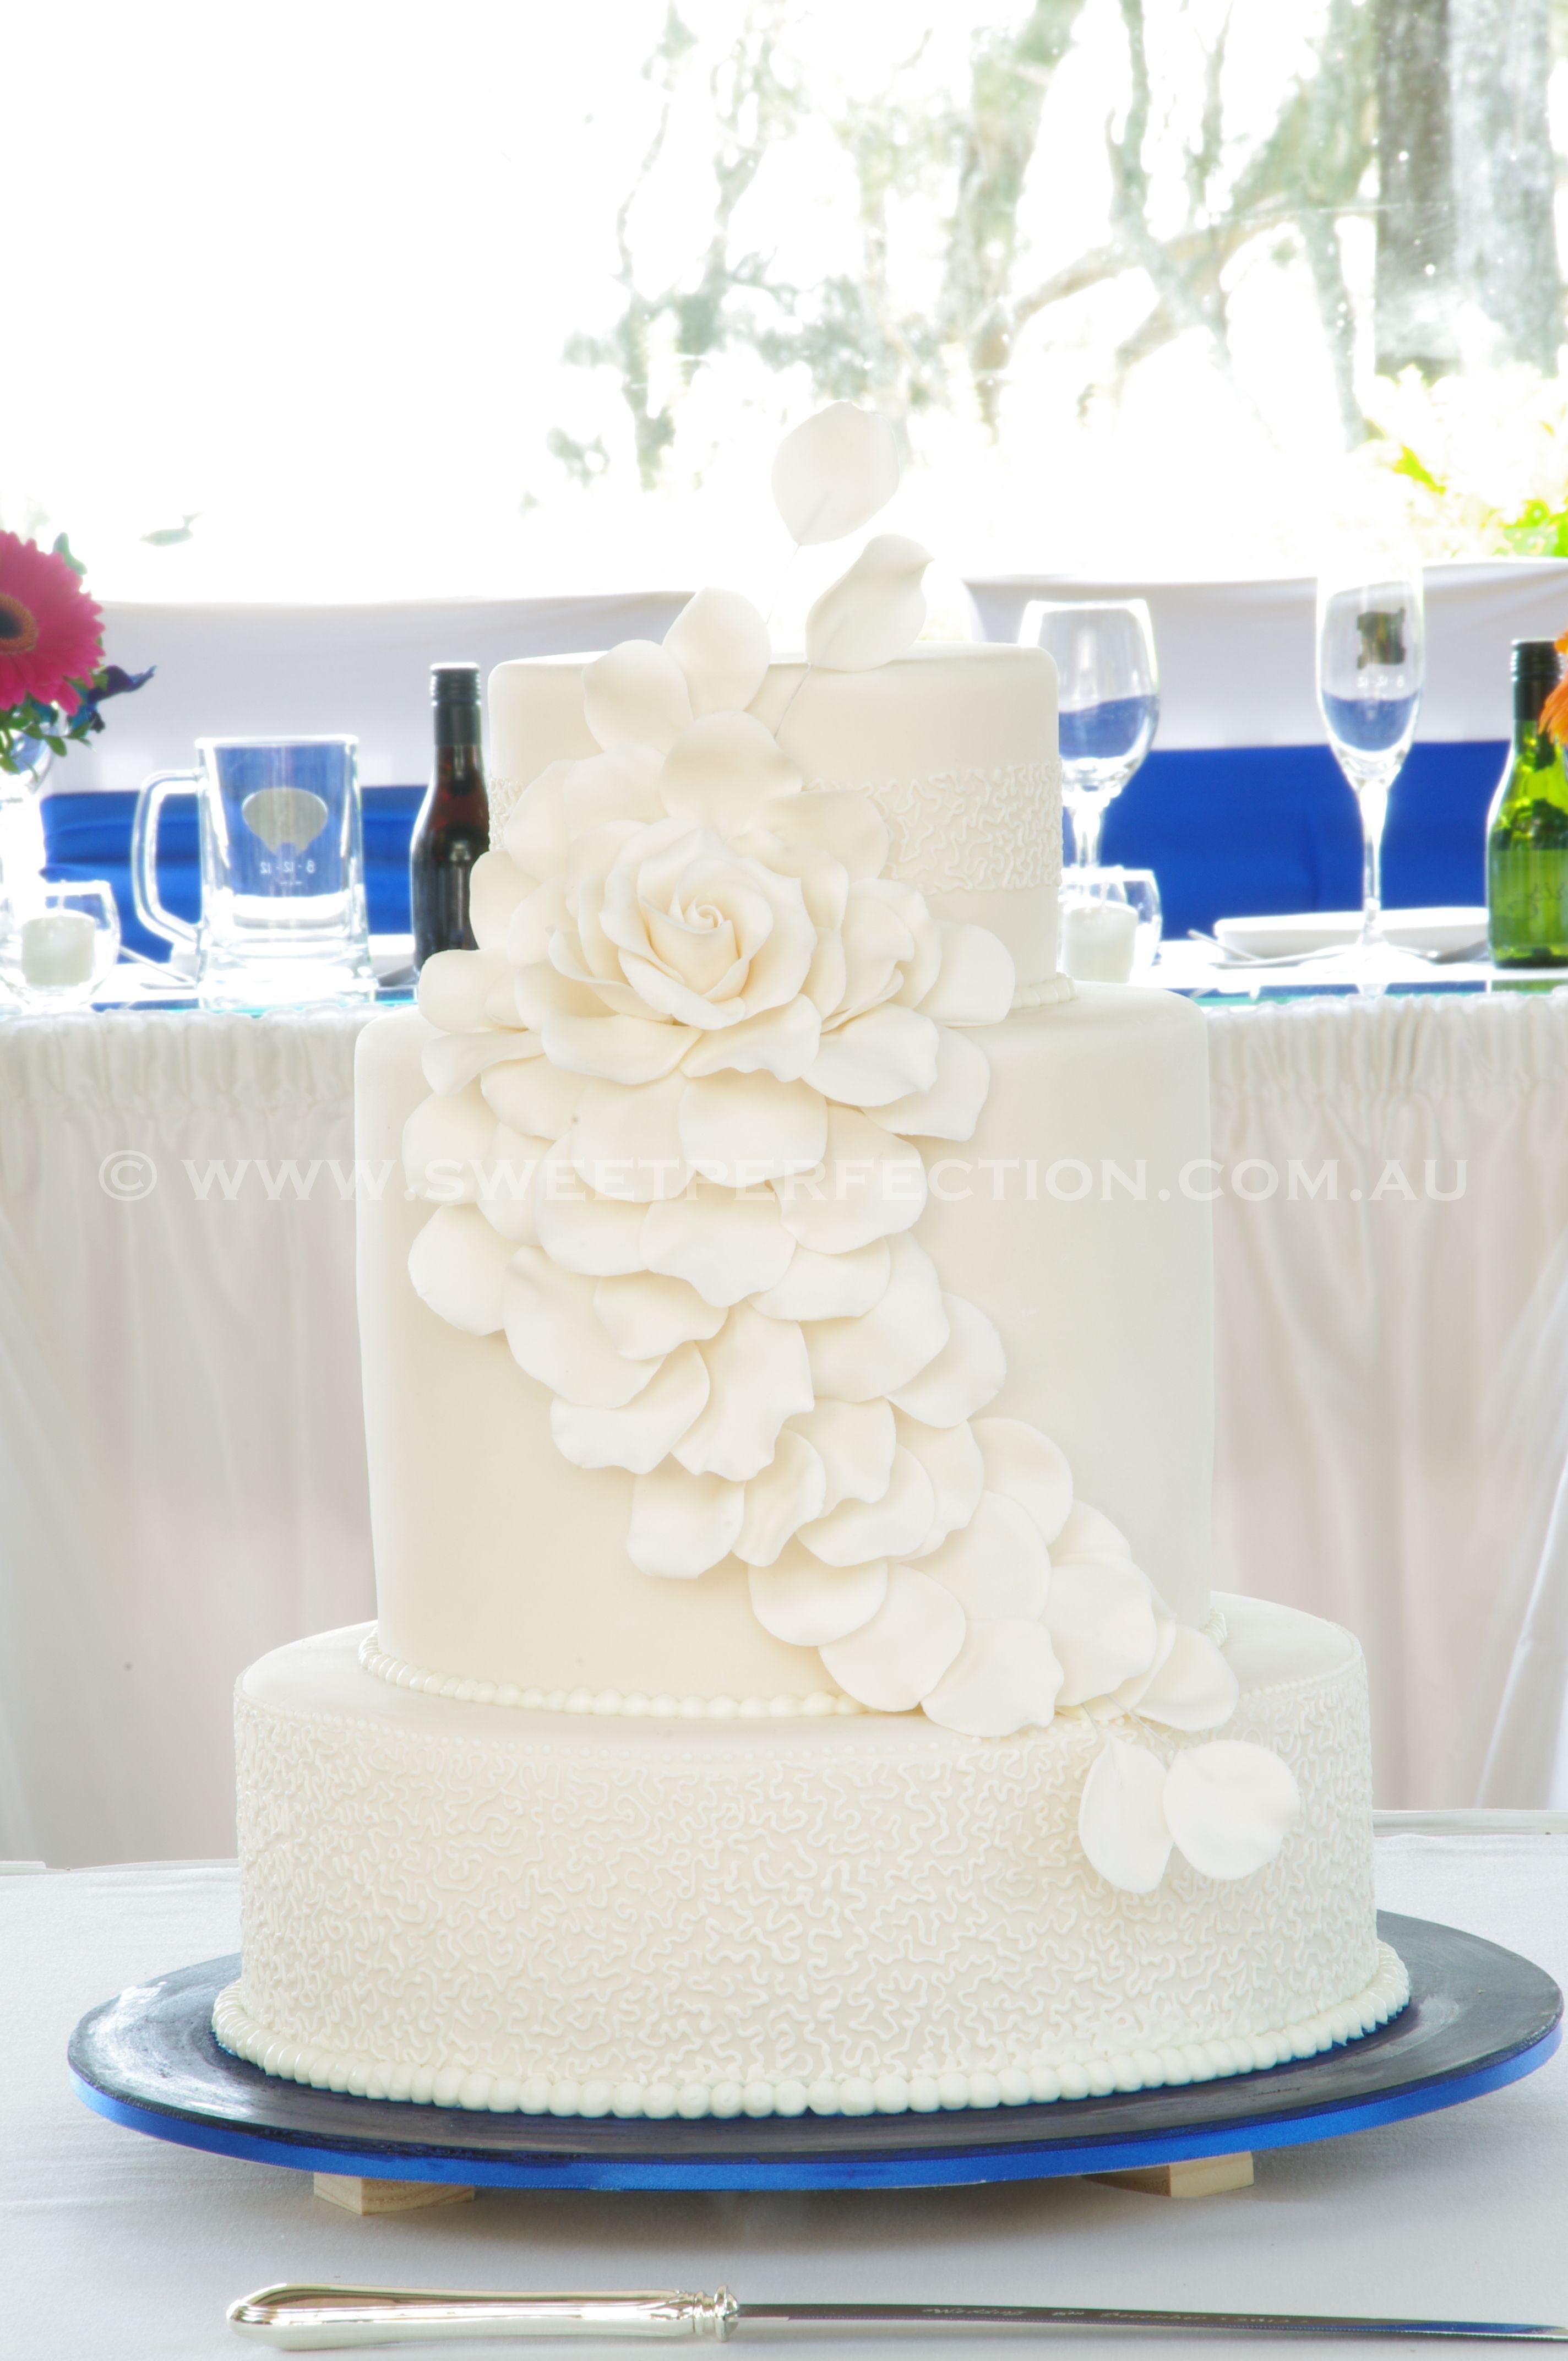 Mandy and Chris\' Wedding Cake - Rafferty\'s Resort, Cams Wharf, NSW ...